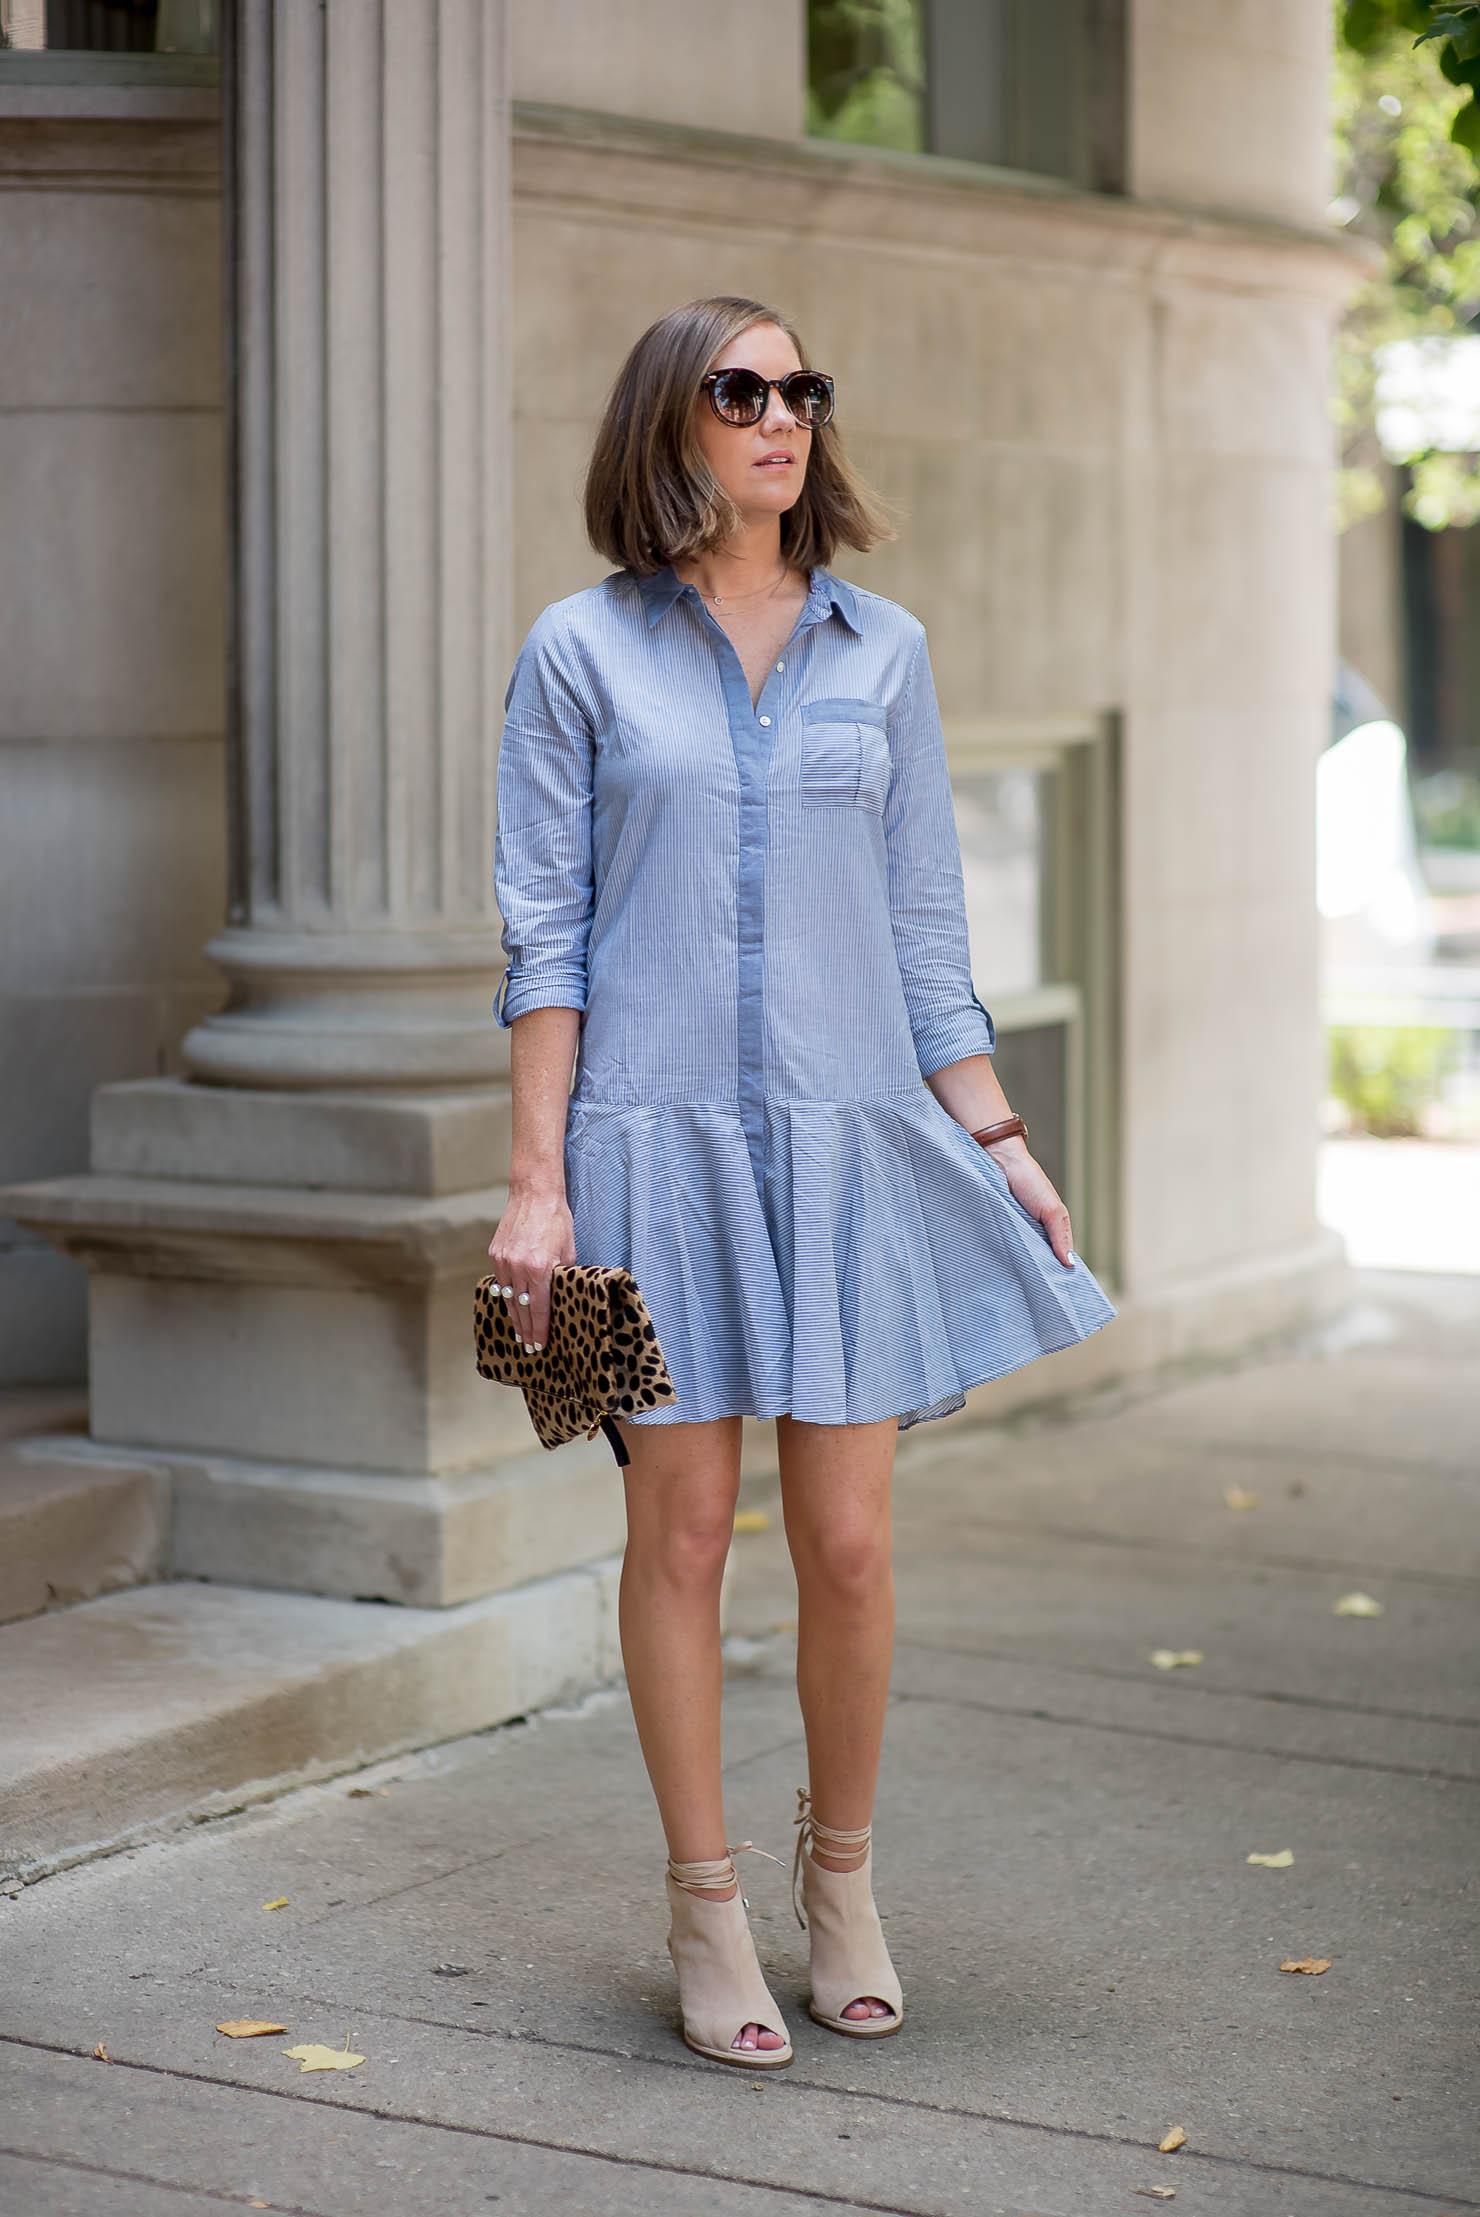 peep toe booties with dress